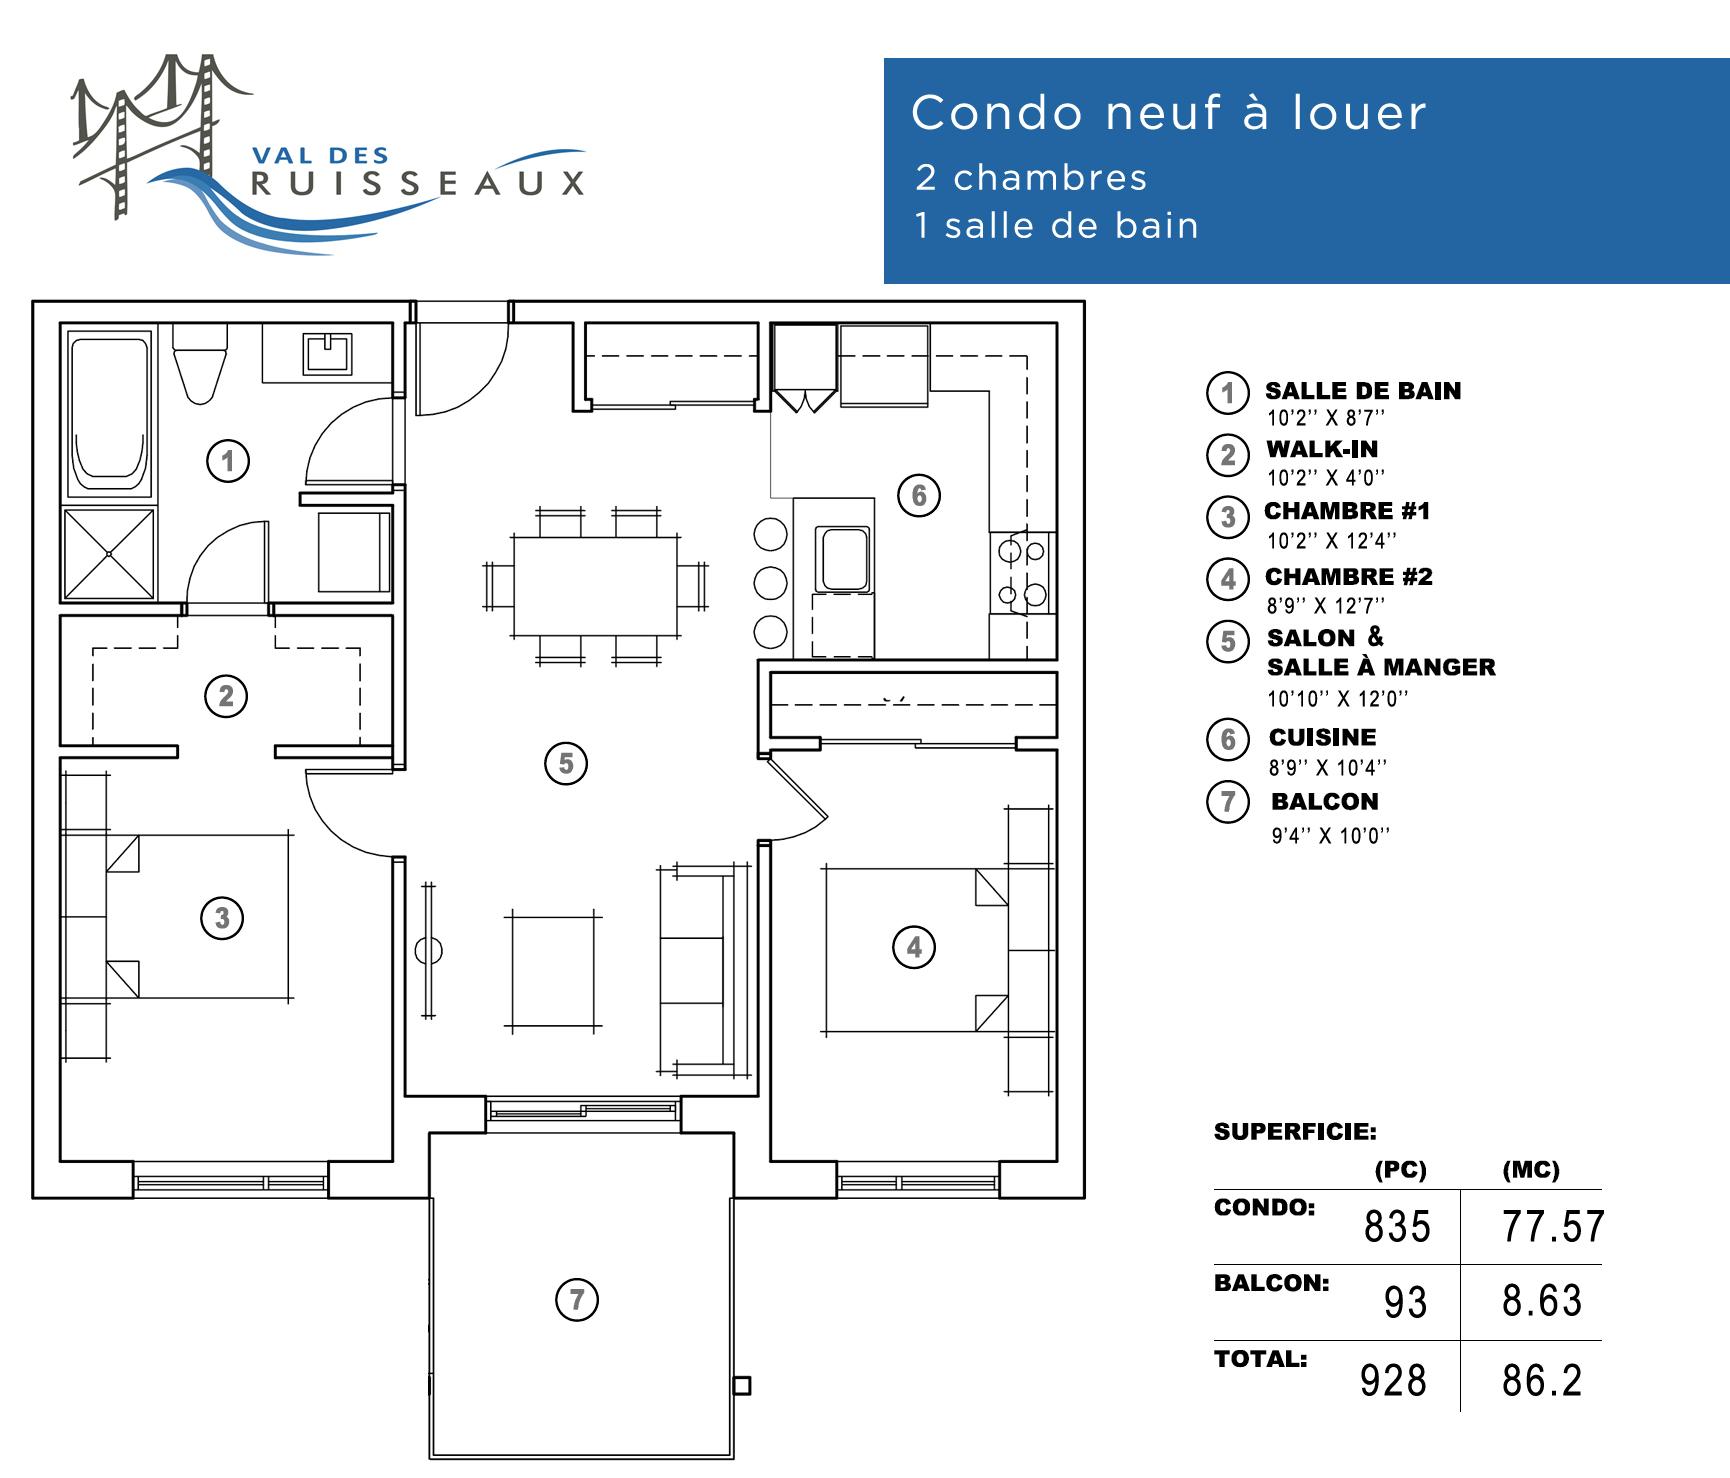 plans-vdr-2cac-835-location